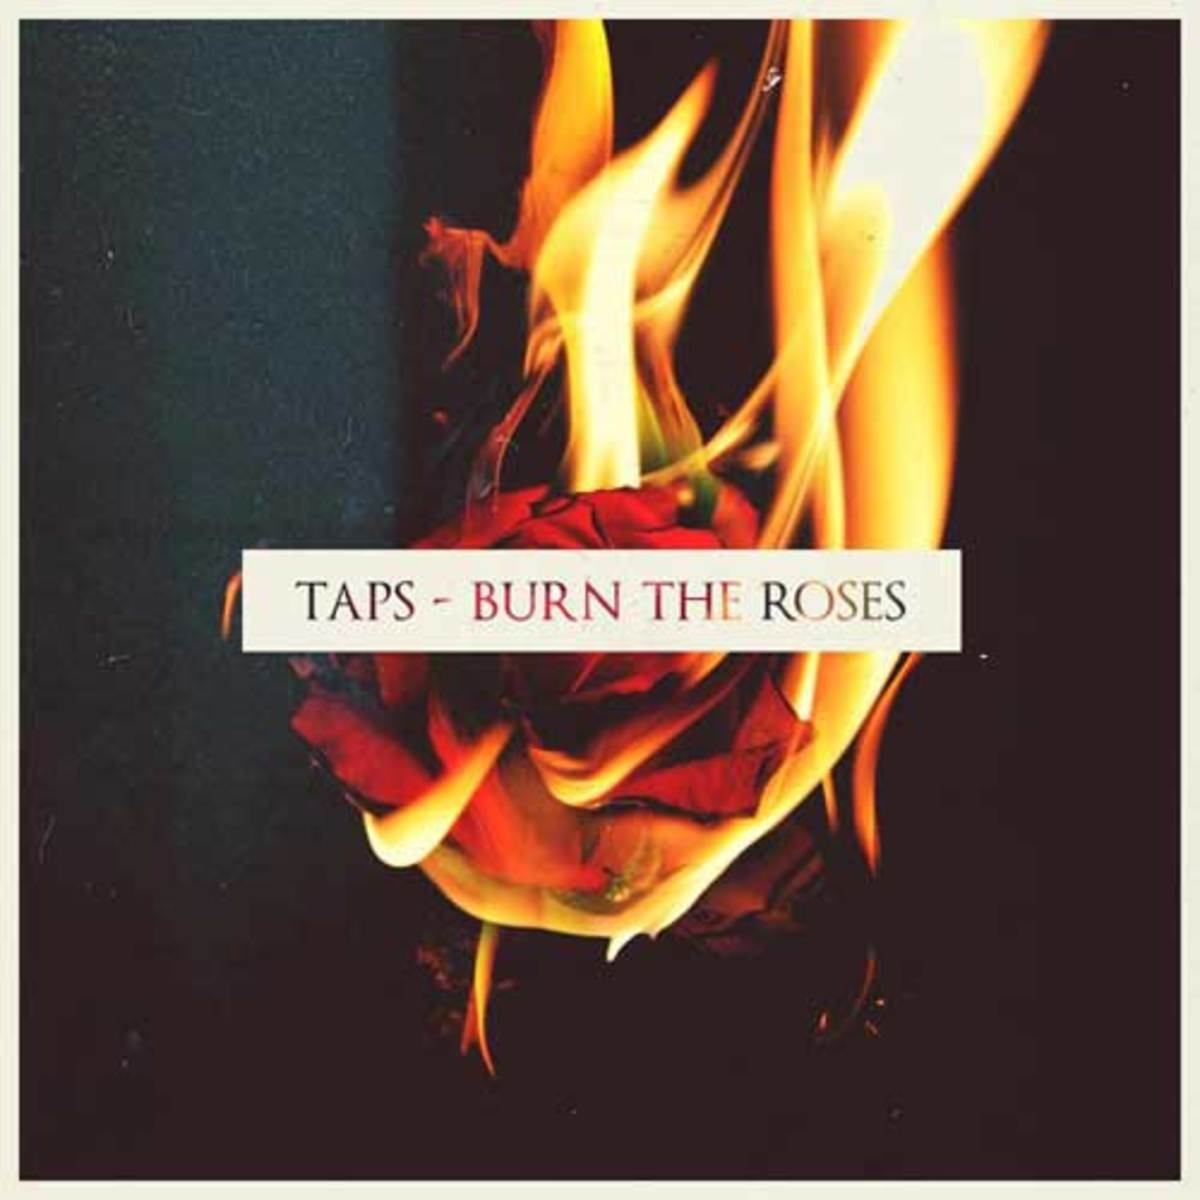 taps-burntheroses.jpg